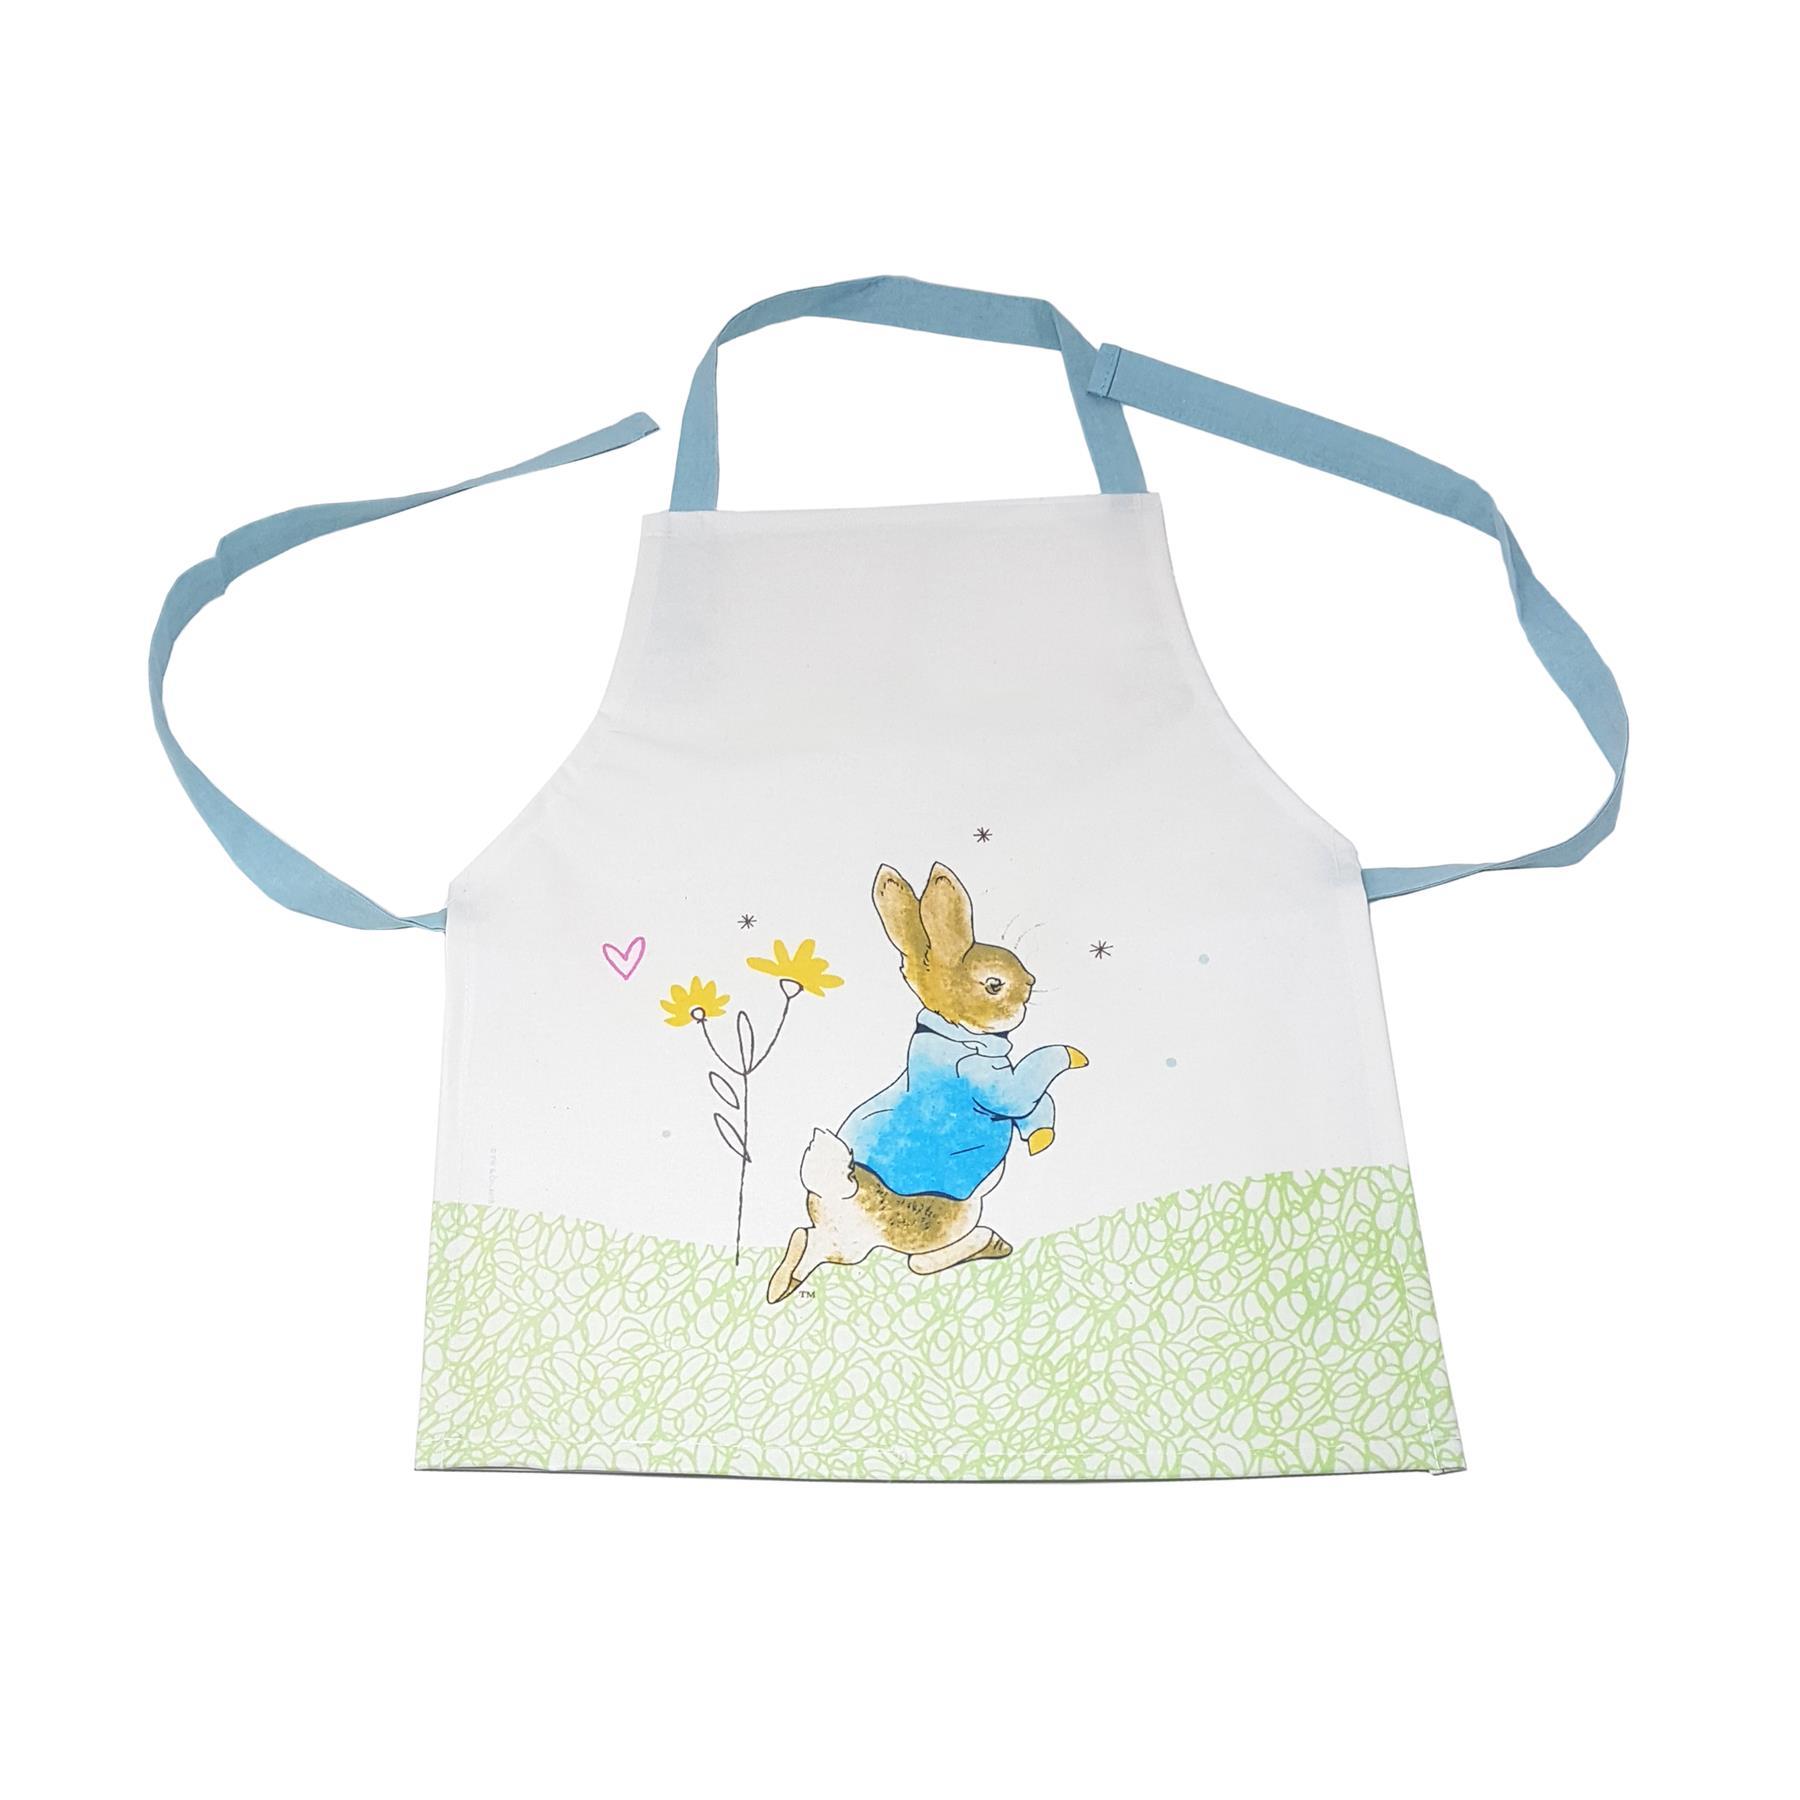 Beatrix Potter Peter Rabbit Childrens Bib